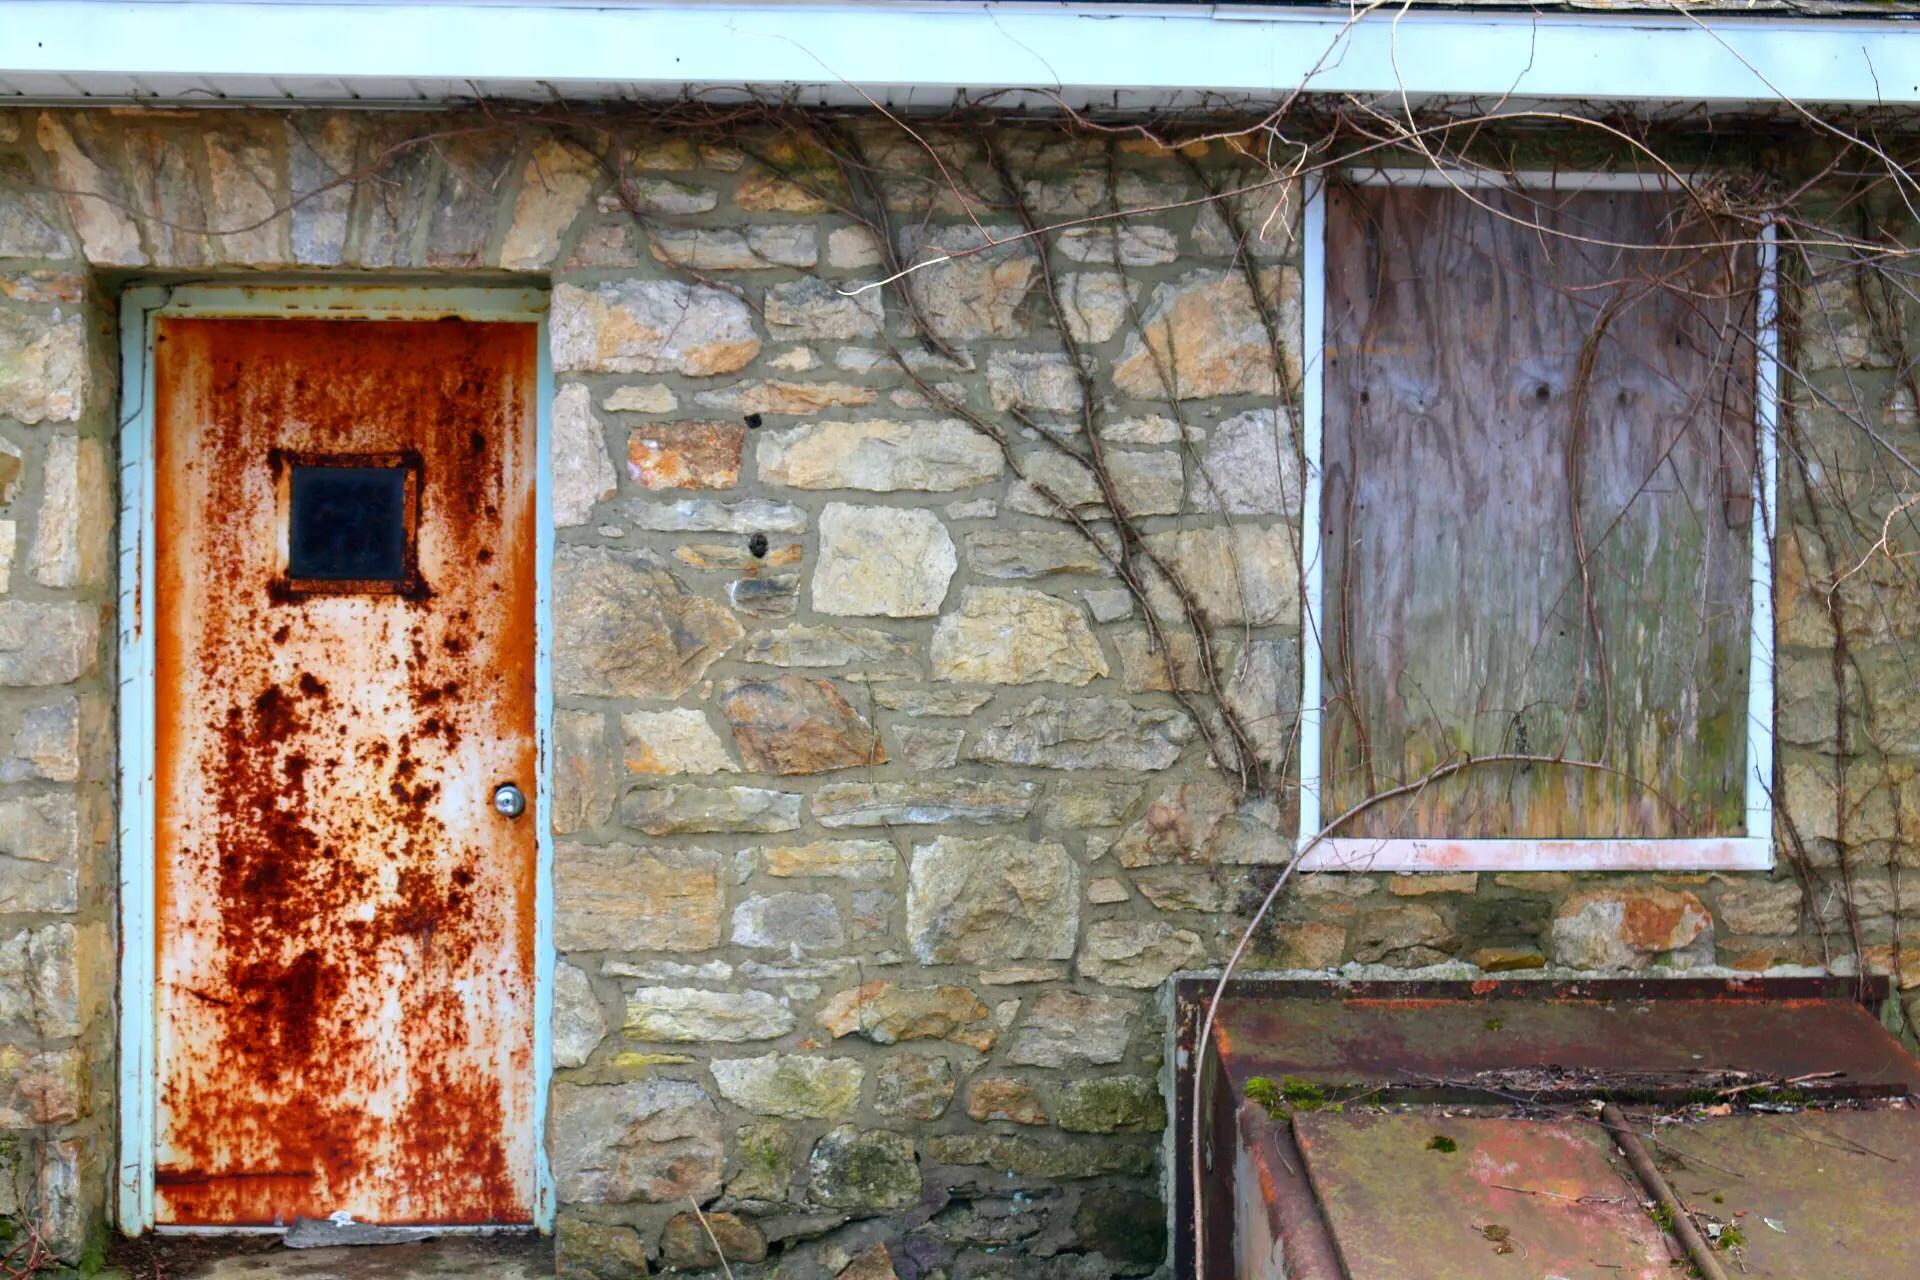 Restore Paint That Keeps Peeling Off A Steel Door & Restore Paint That Keeps Peeling Off A Steel Door | The DIY Life